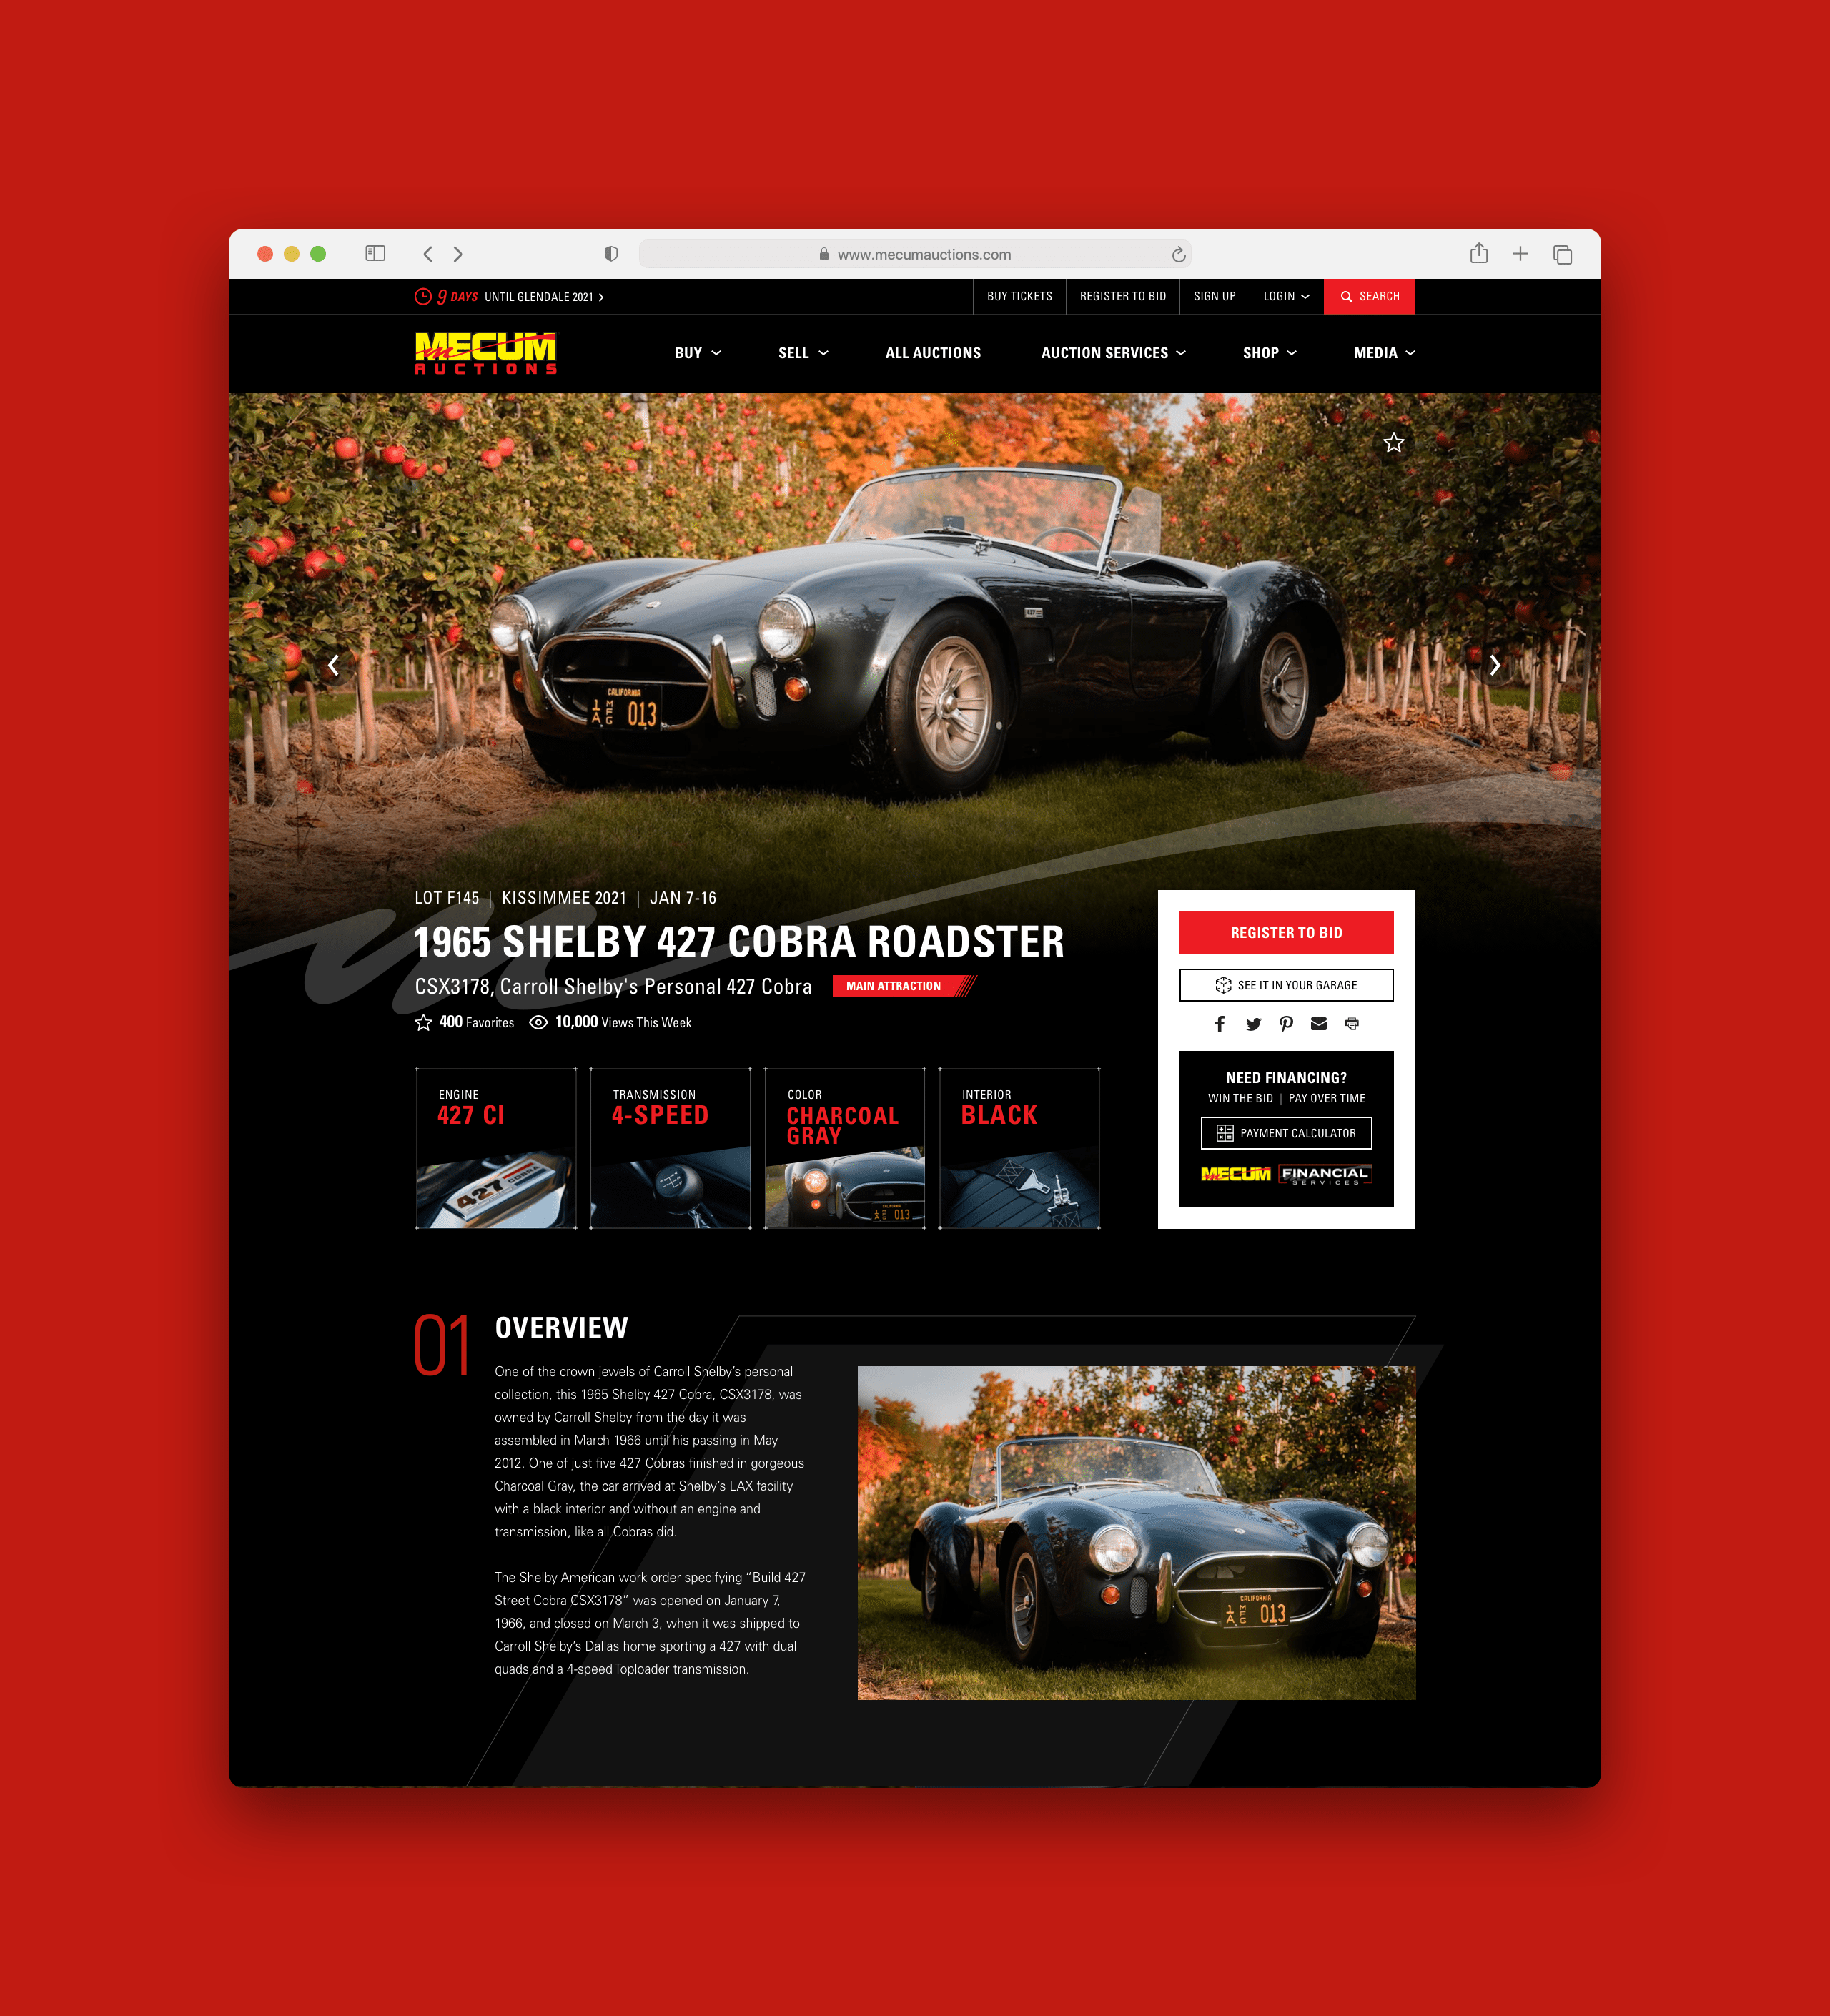 Mecum Premium Auction Detail Page Zoomed